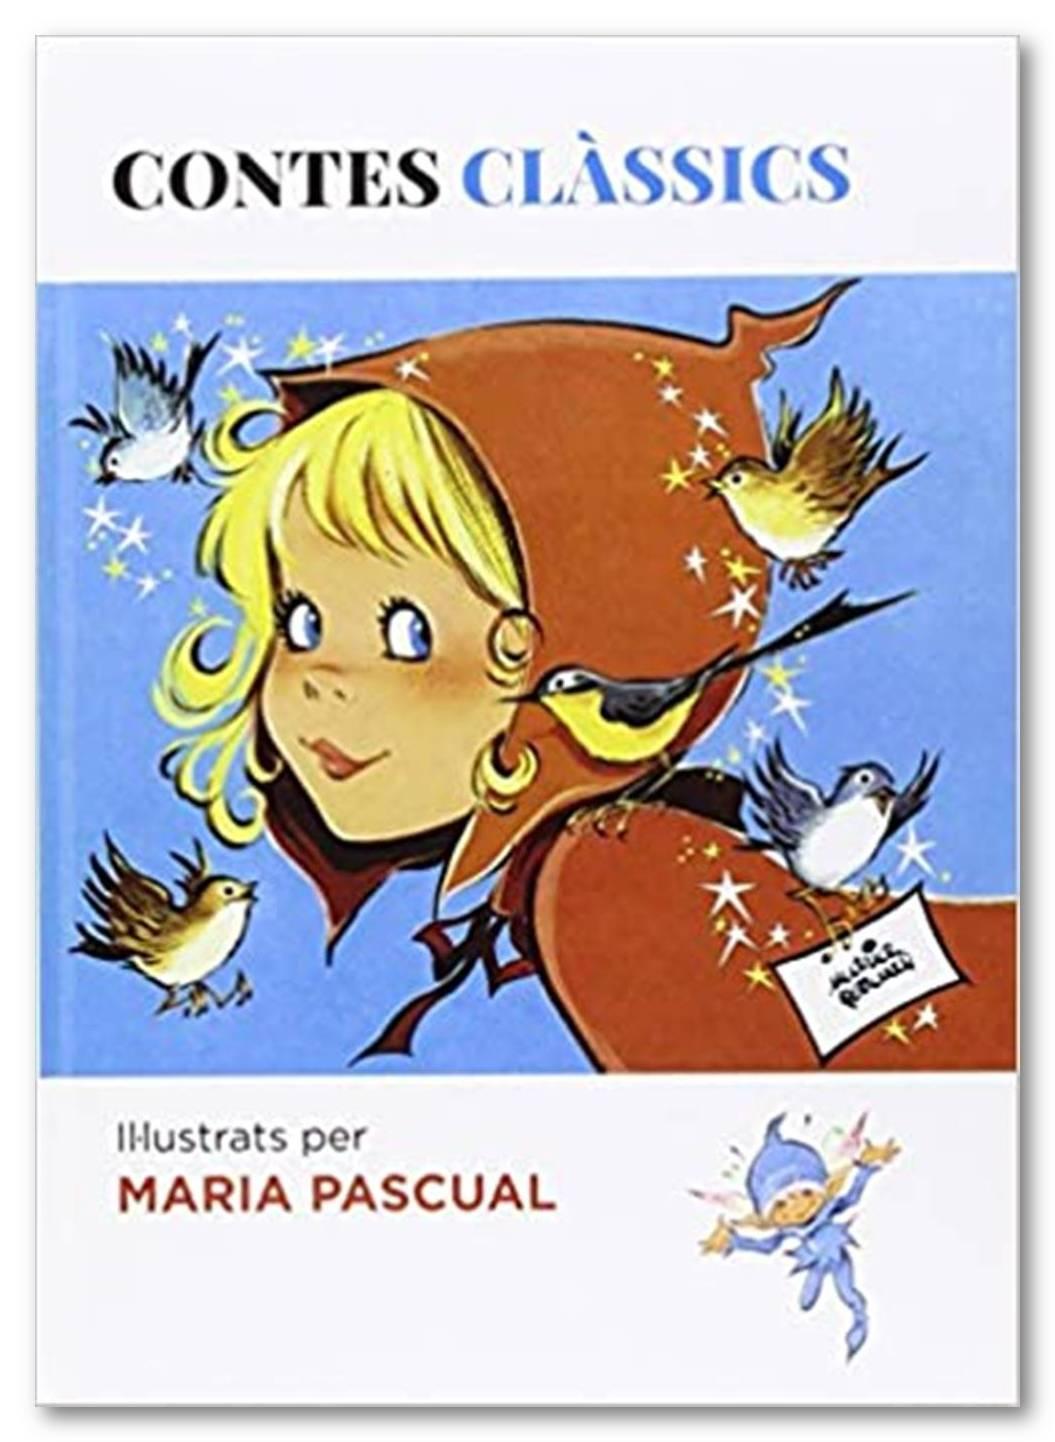 Contes clàssics il-lustrats  per María Pascual